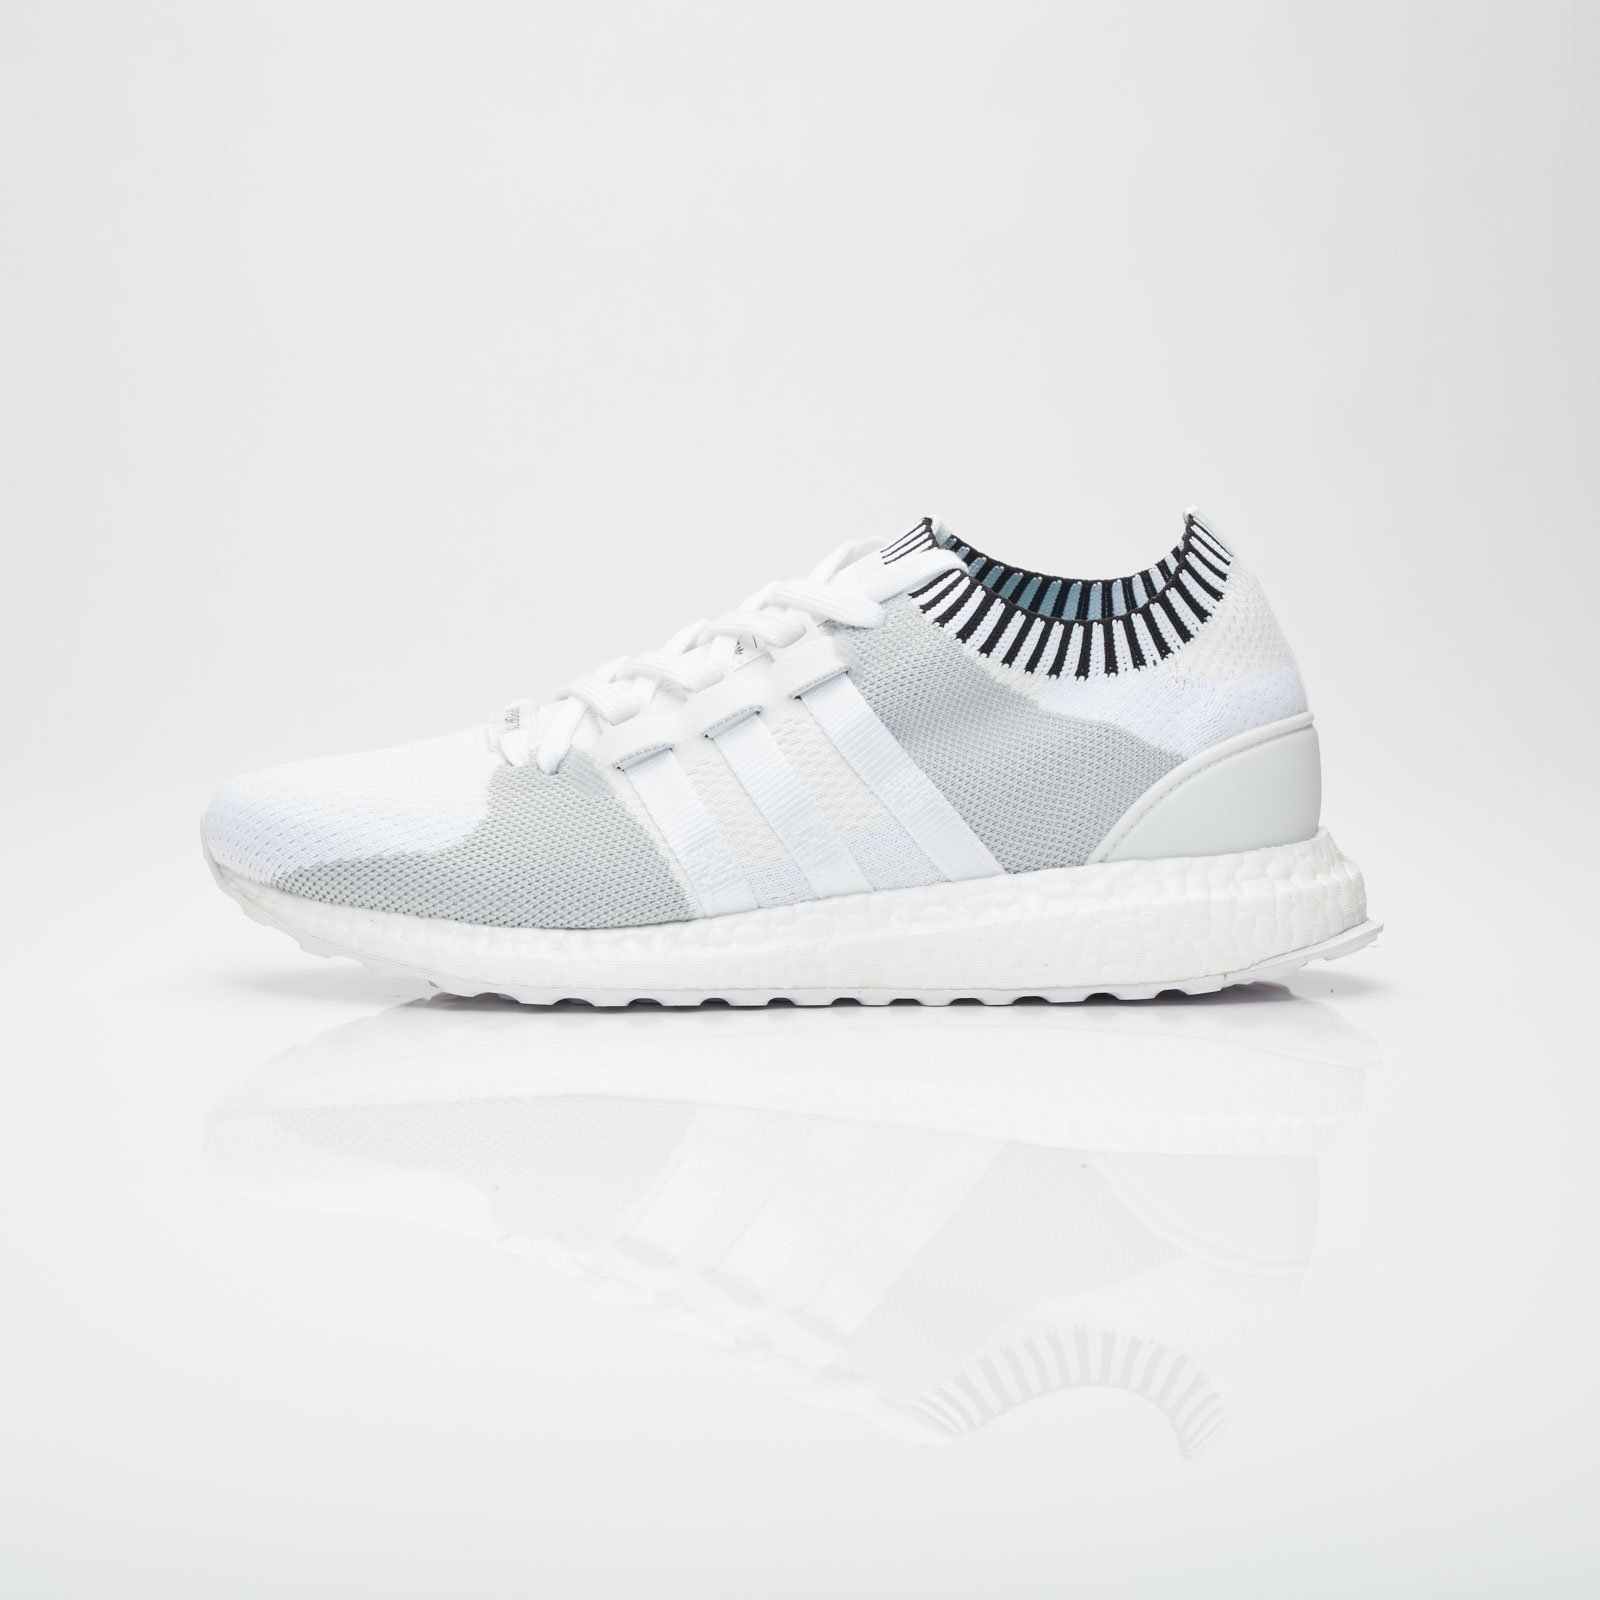 a8784710569d adidas EQT Support Ultra PK - Bb1243 - Sneakersnstuff